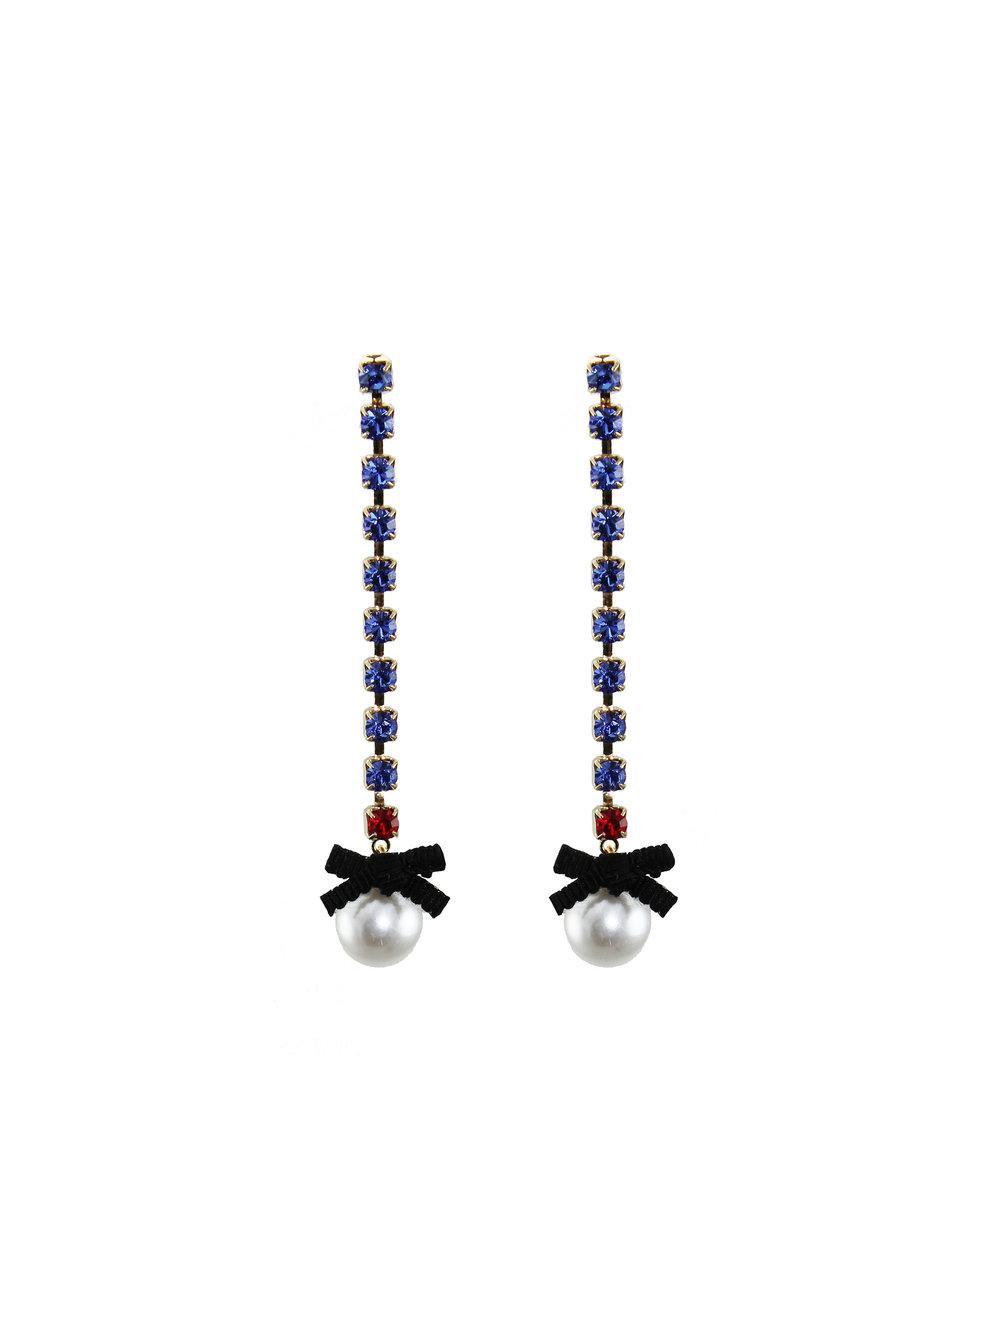 074 - Sapphire & Pearl Bow Earrings.jpg